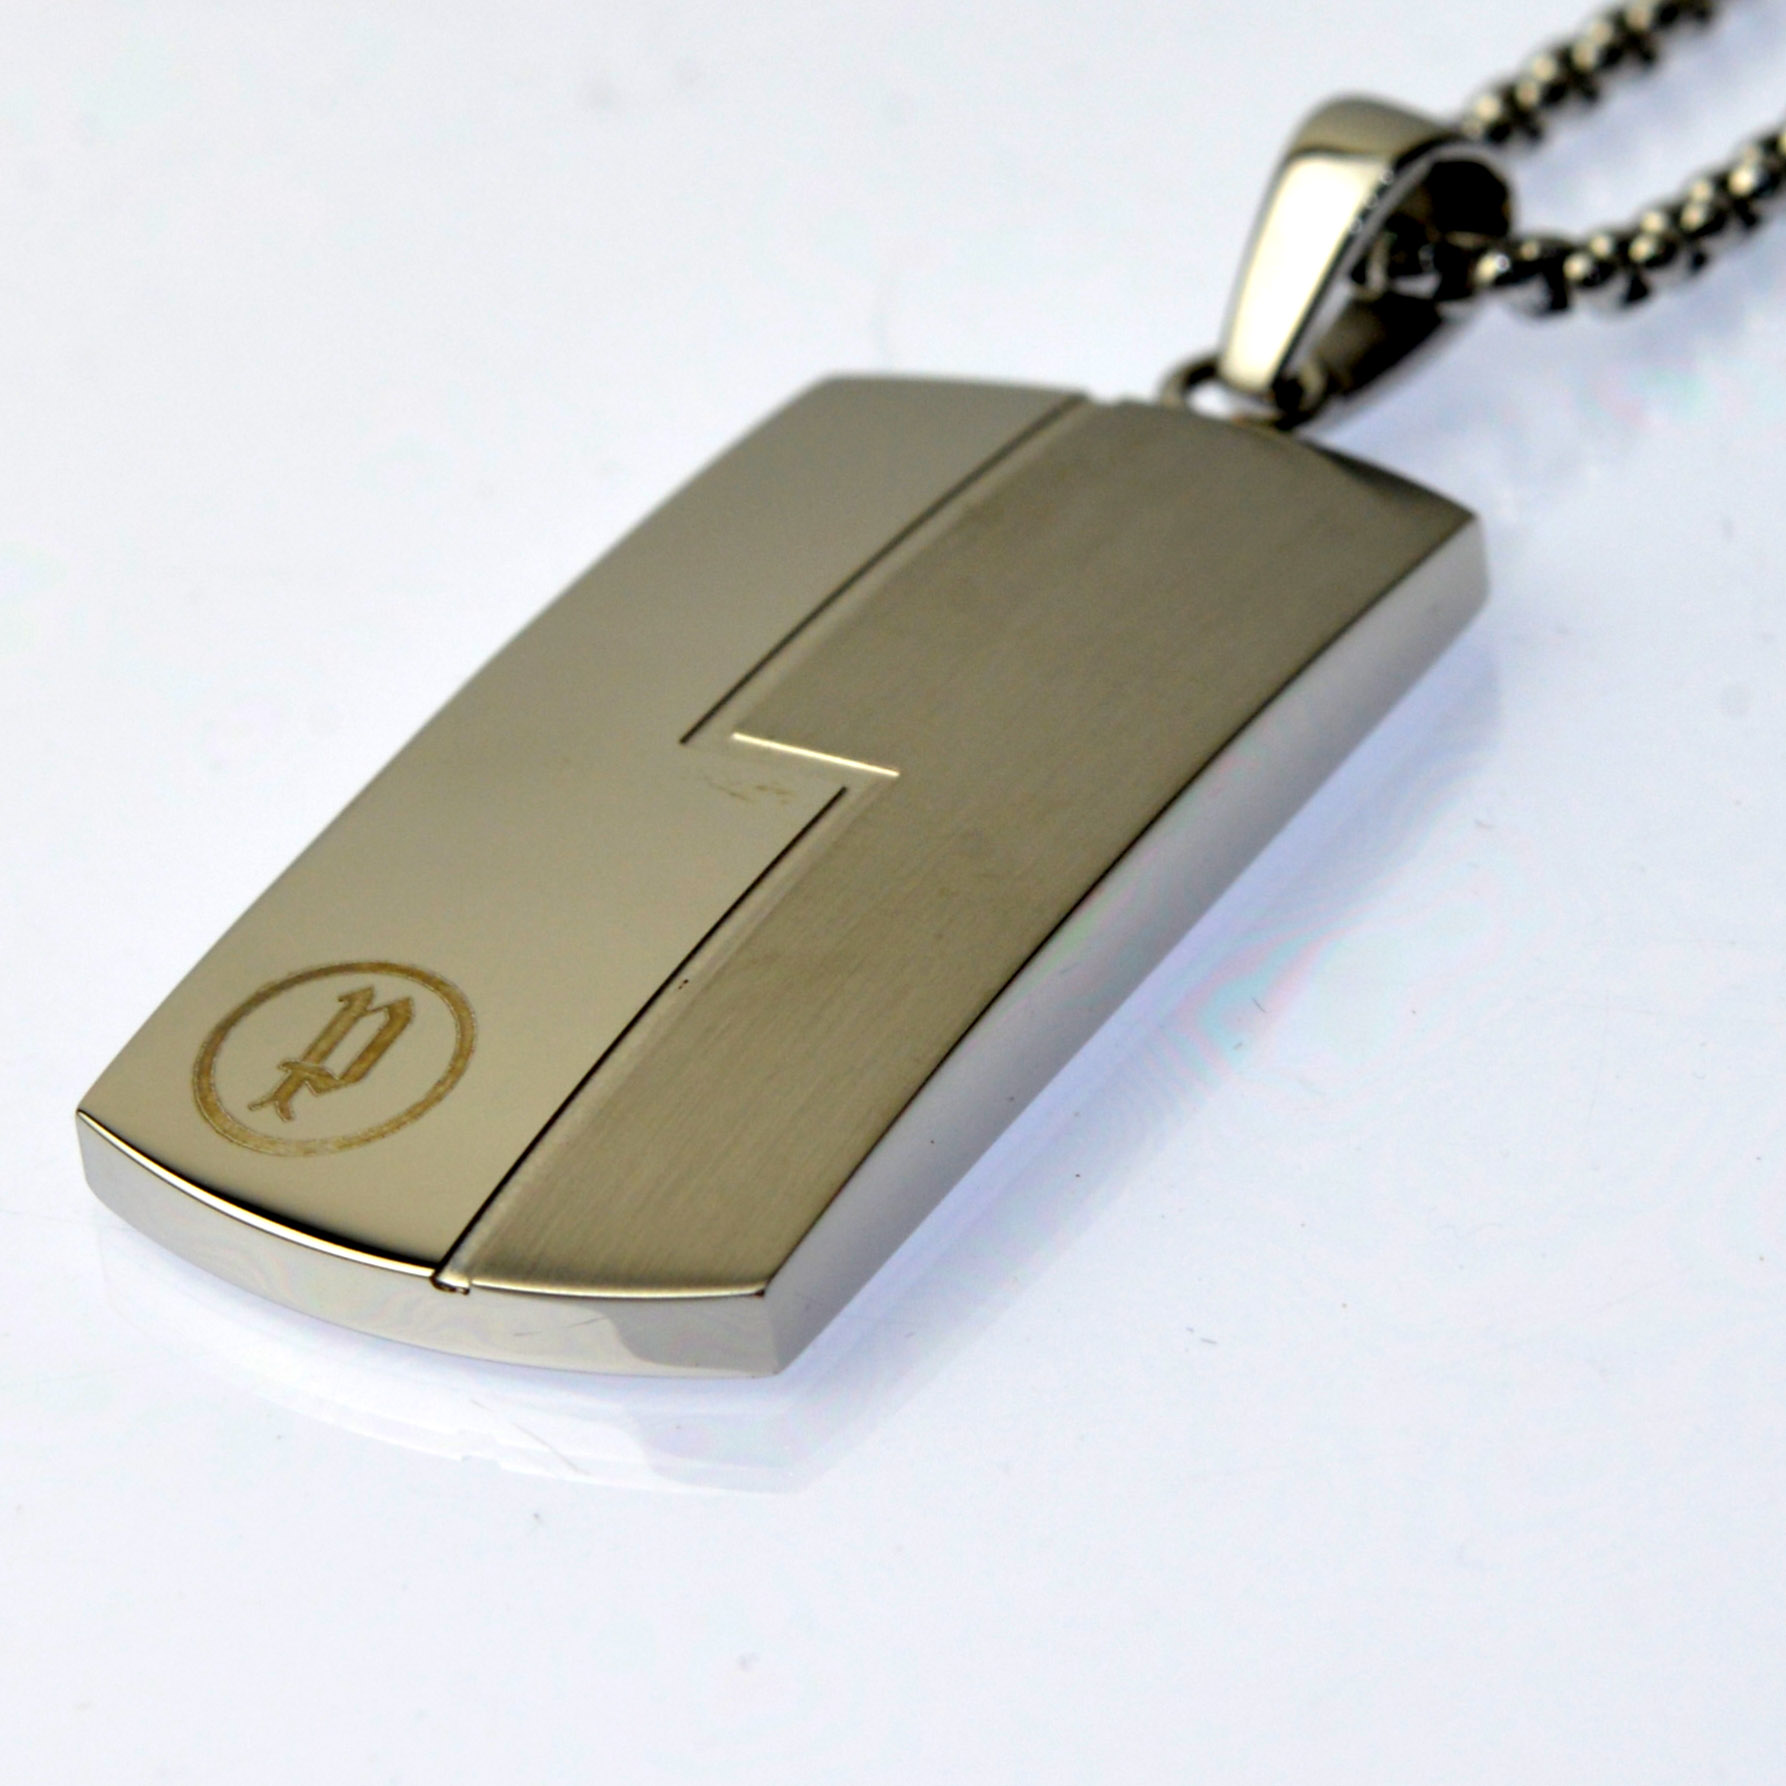 http://www.police.ne.jp/images/police__necklace_10.jpg